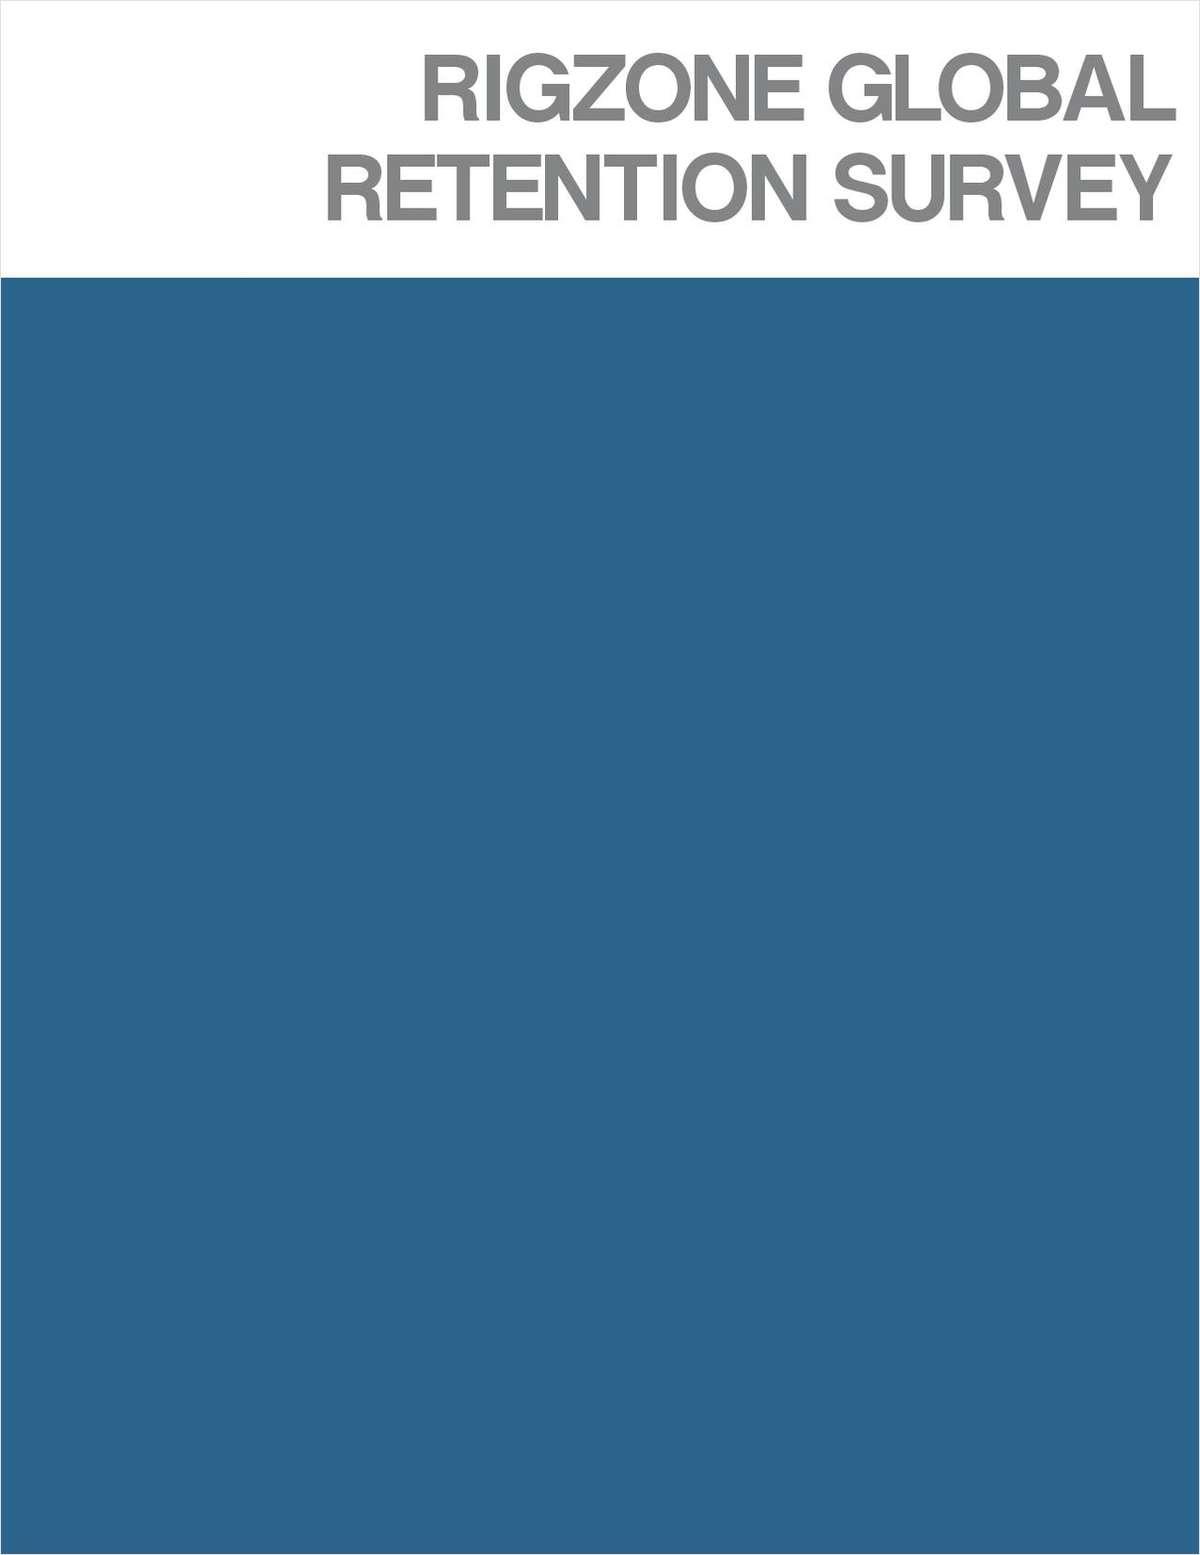 Rigzone Global Retention Survey